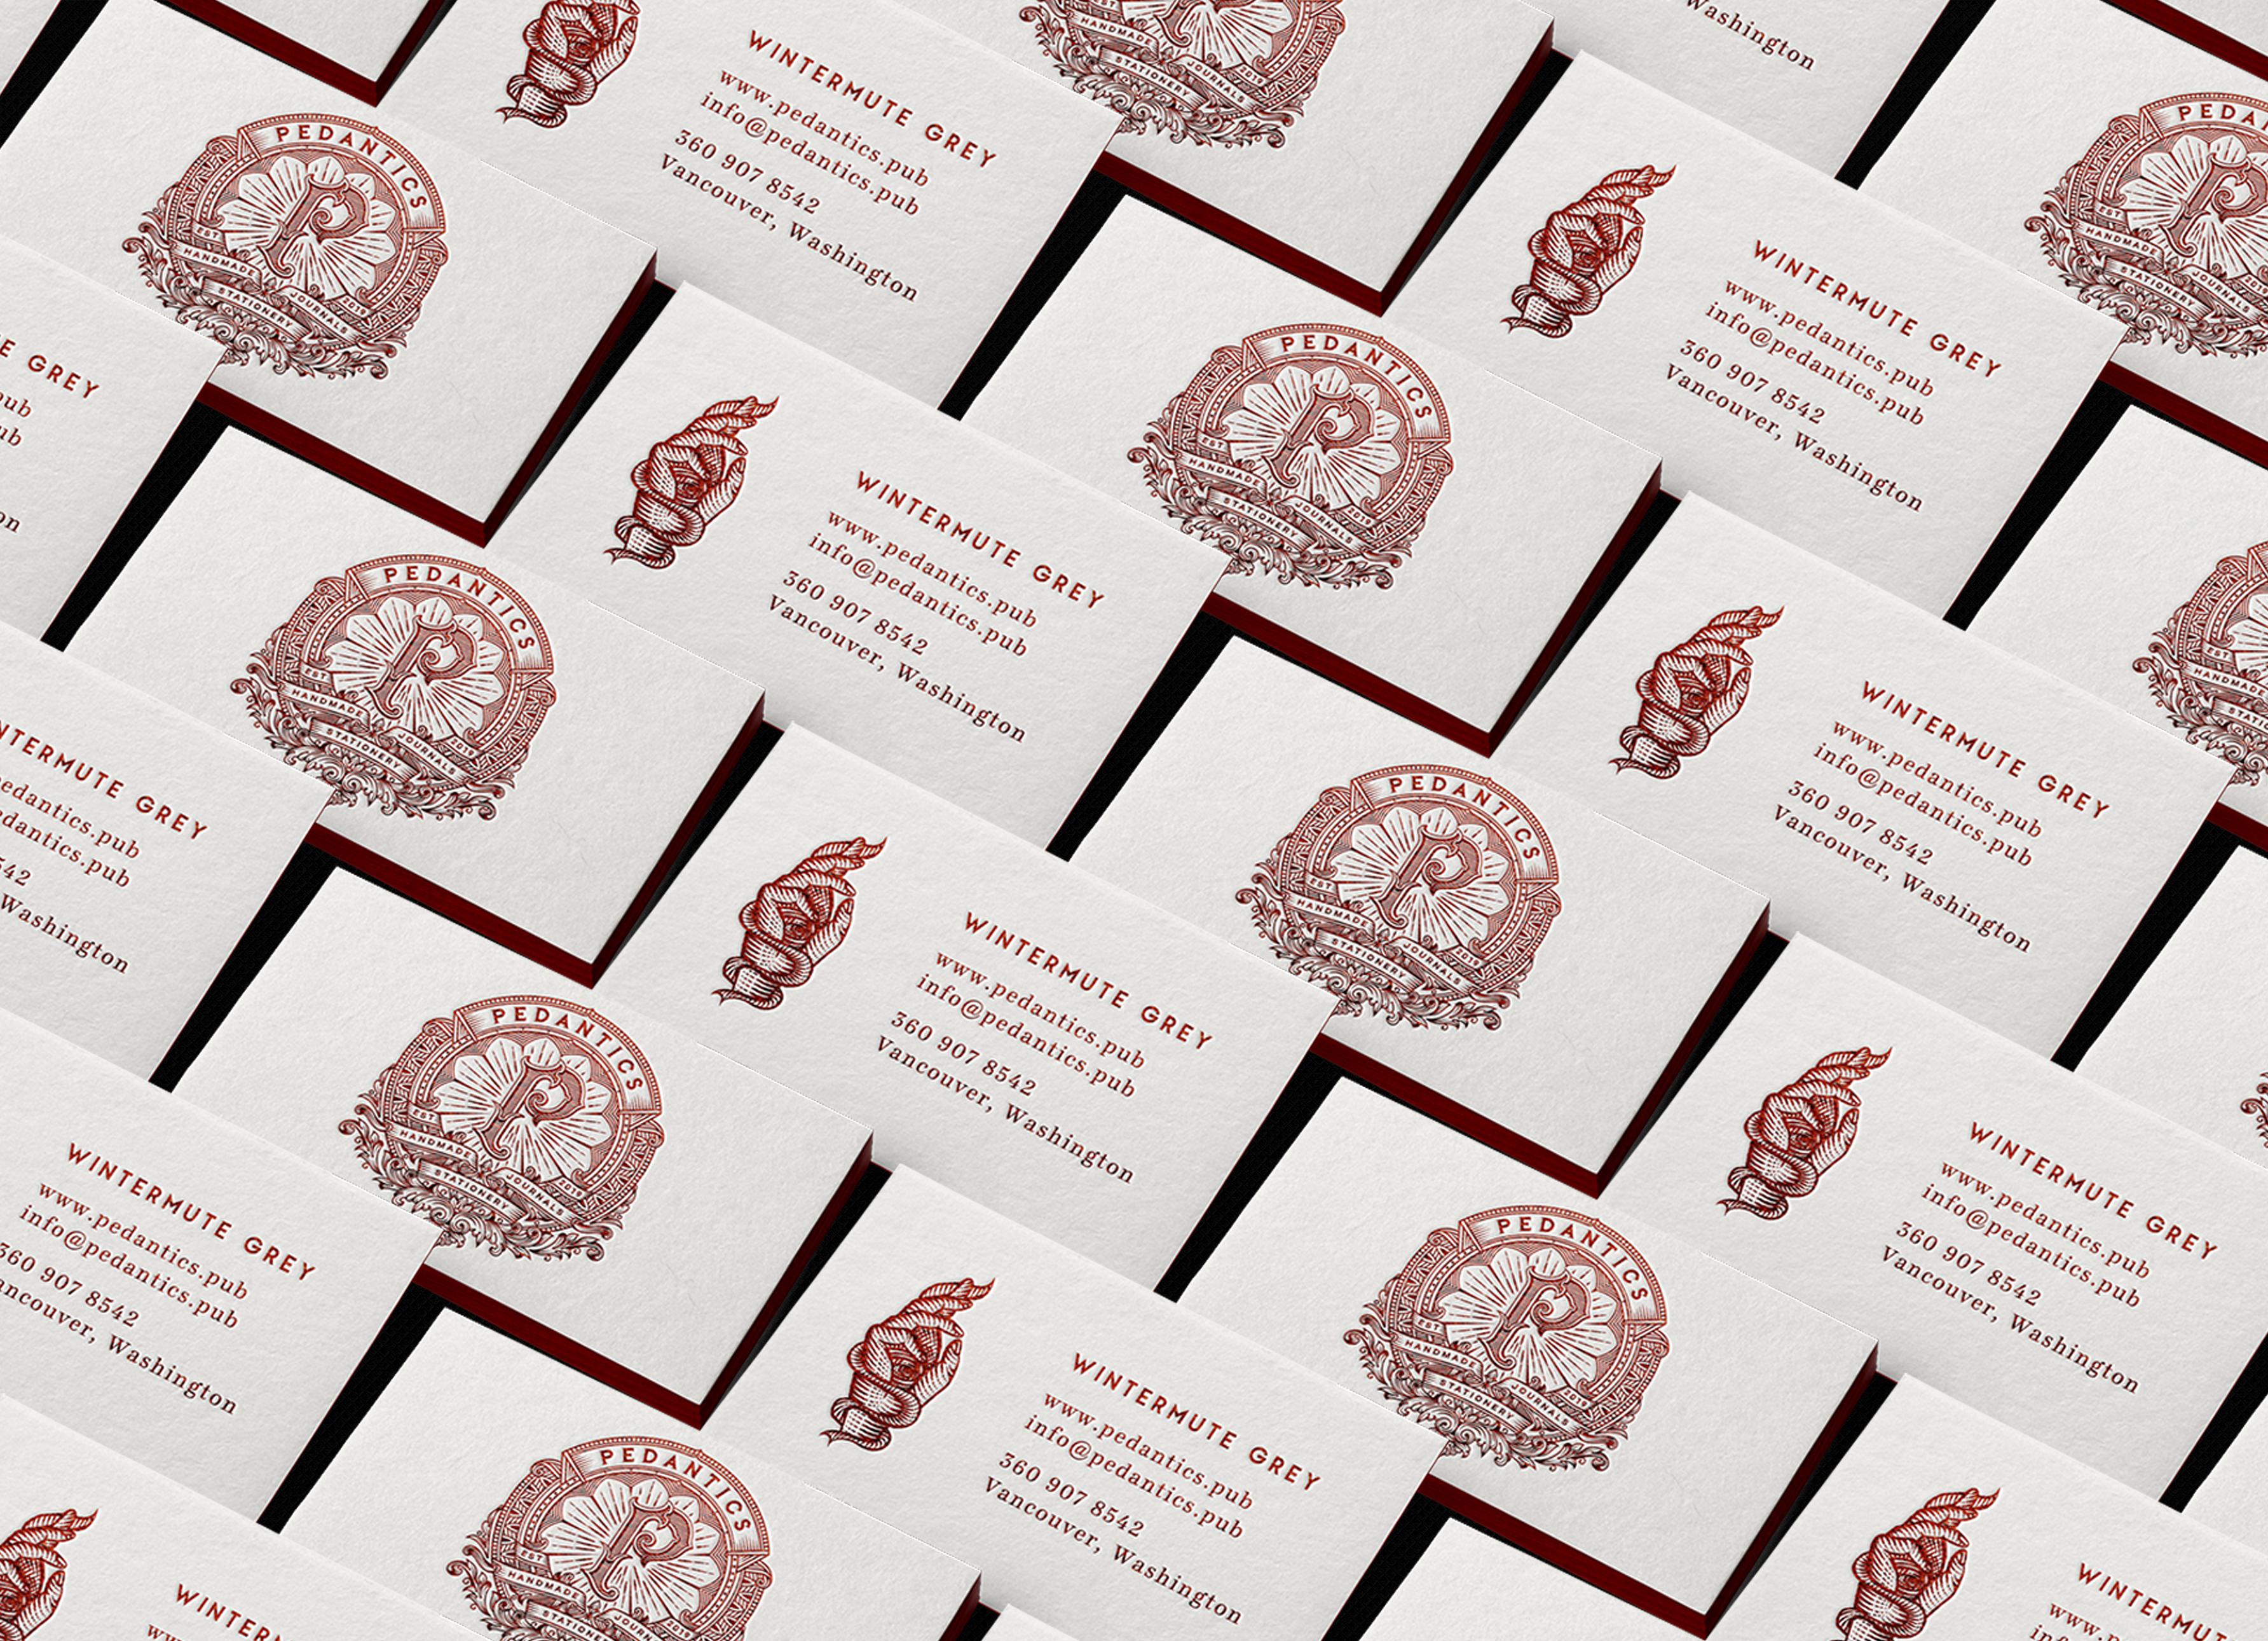 Pedantics business cards